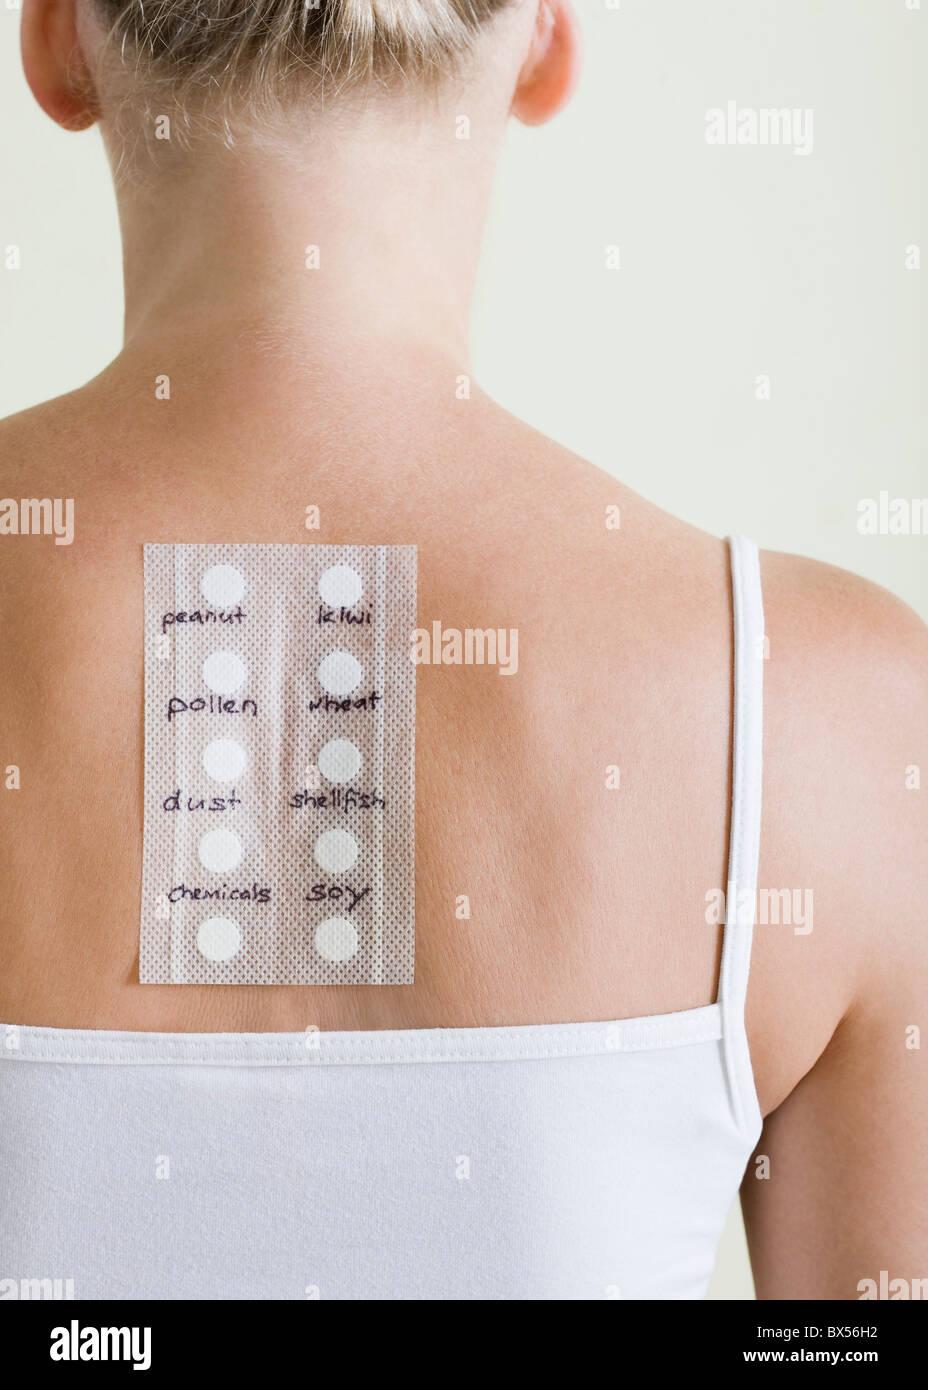 Allergy test - Stock Image